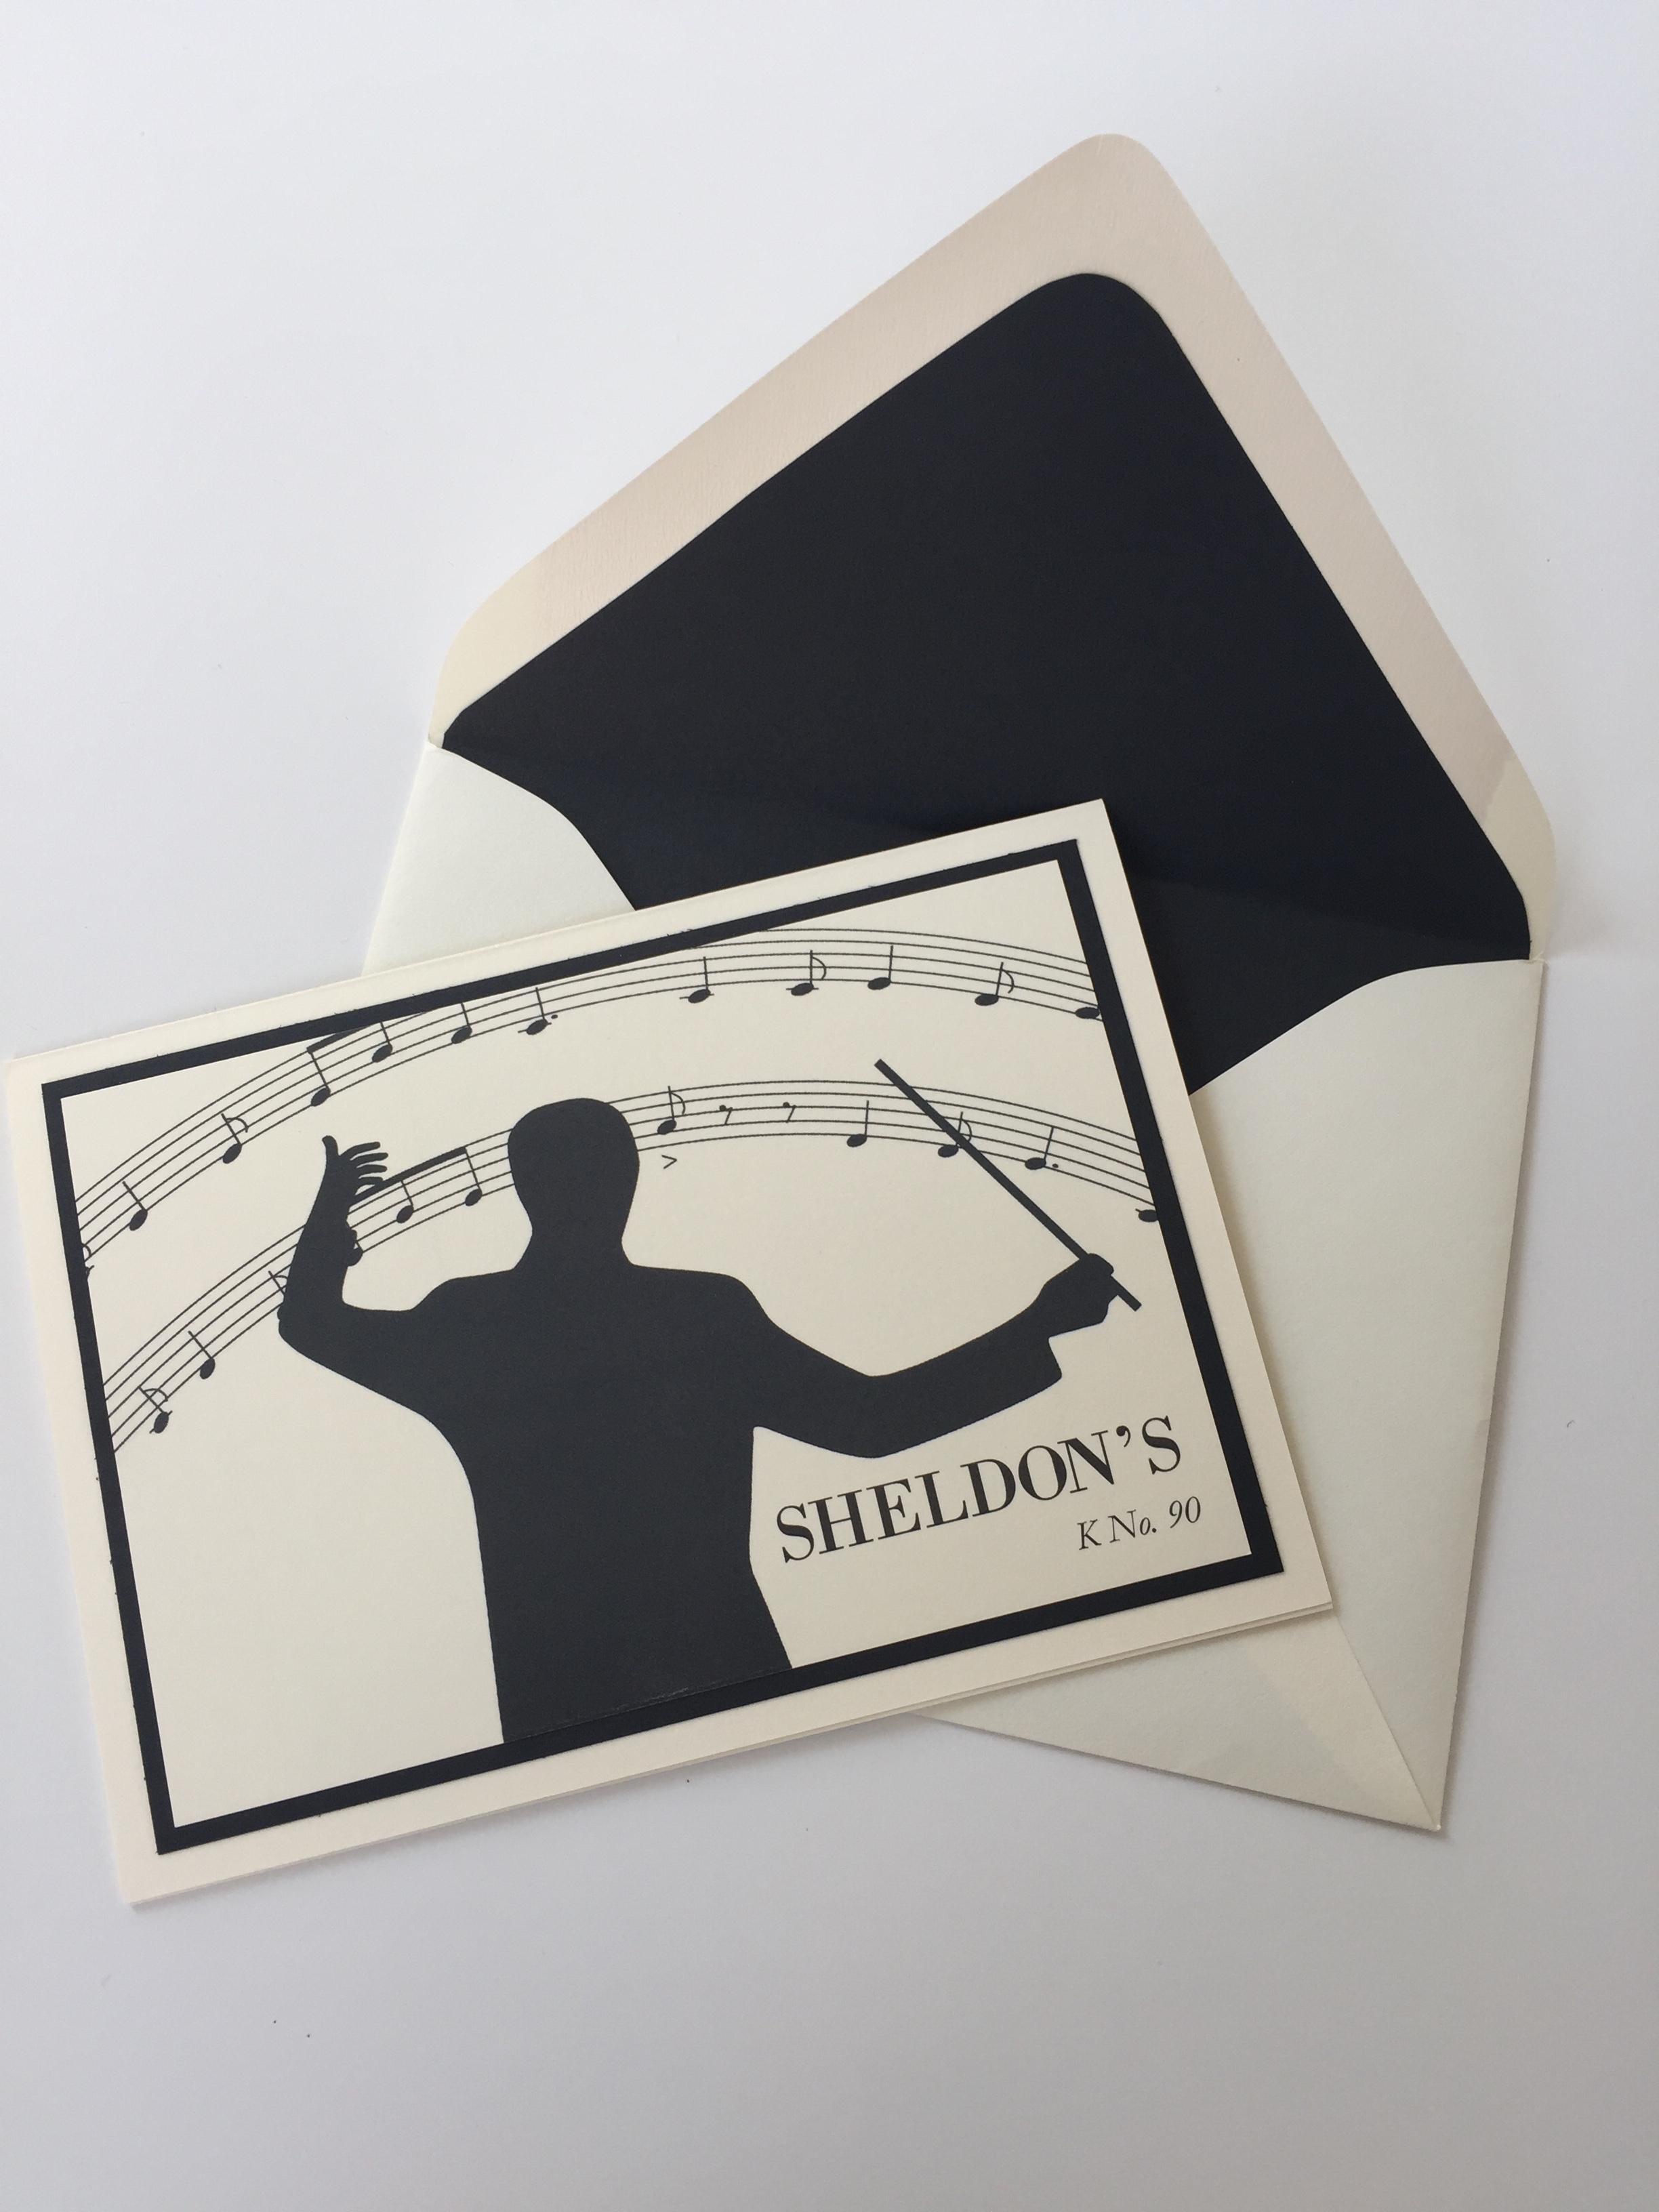 sheldon's invite.jpg